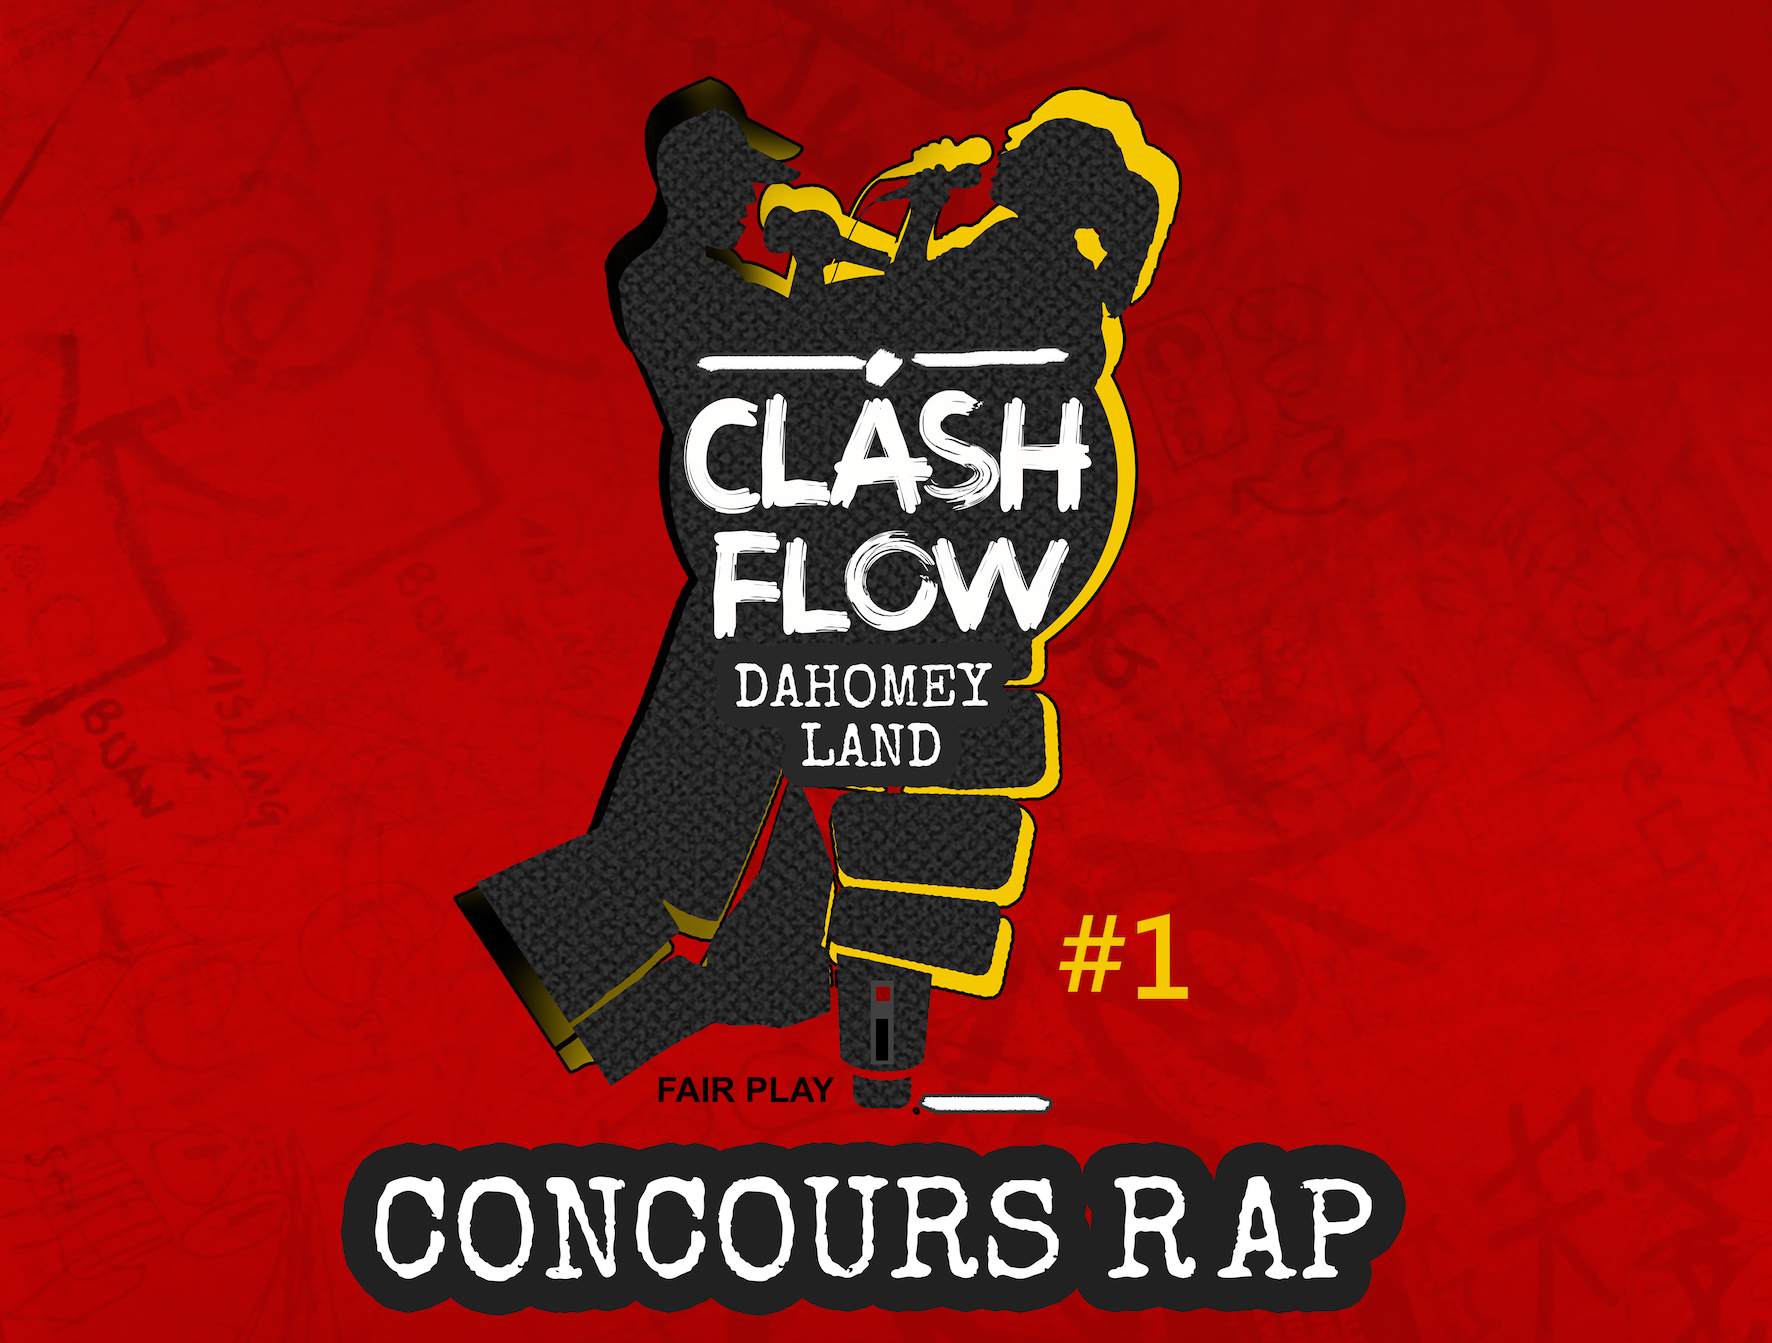 Clash Flow // Dahomey Land